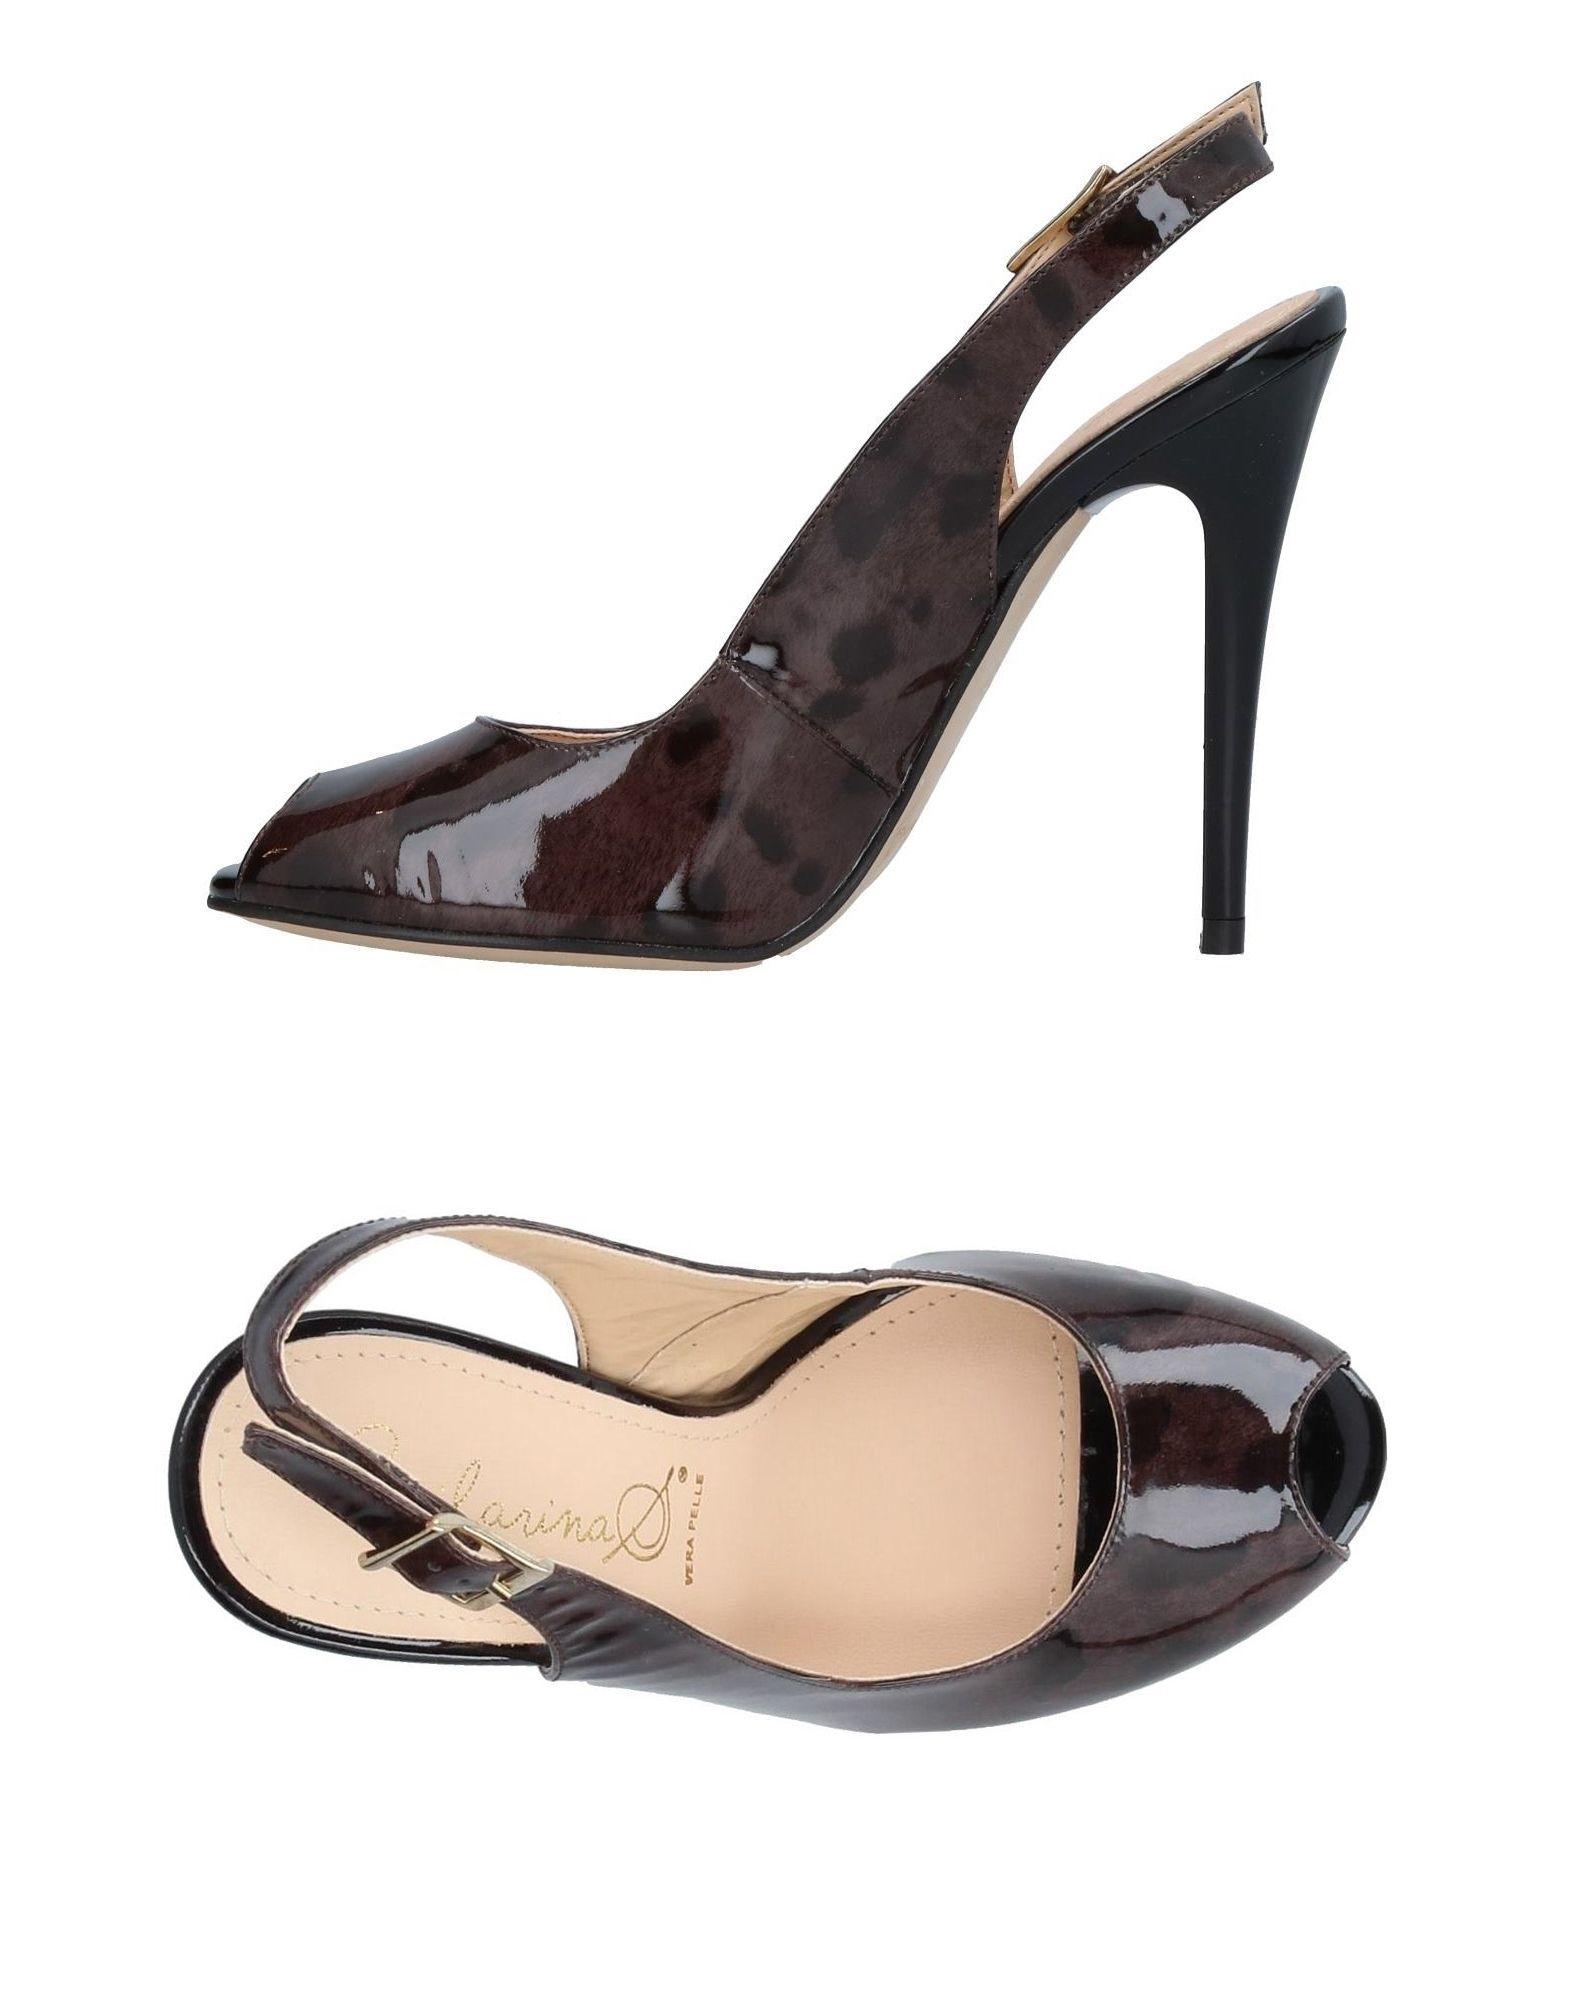 Chaussures - Chaussures Sandales De Ska 3QvvqlW5Bh